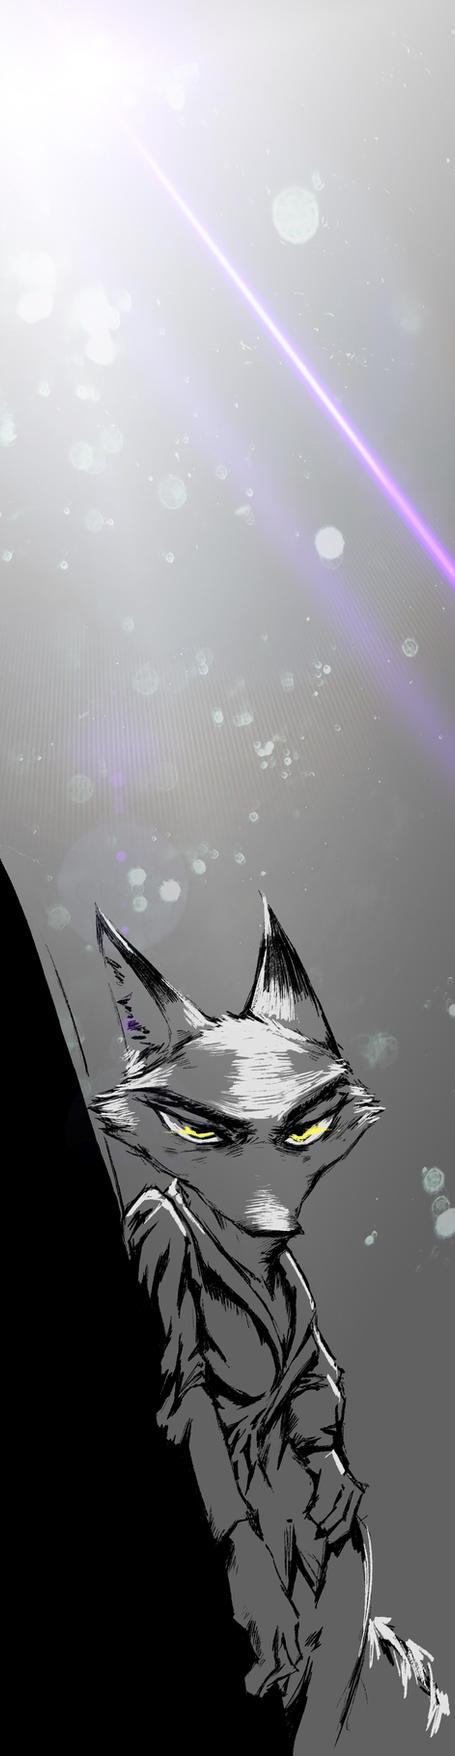 Kyubi by TheWyvernsWeaver